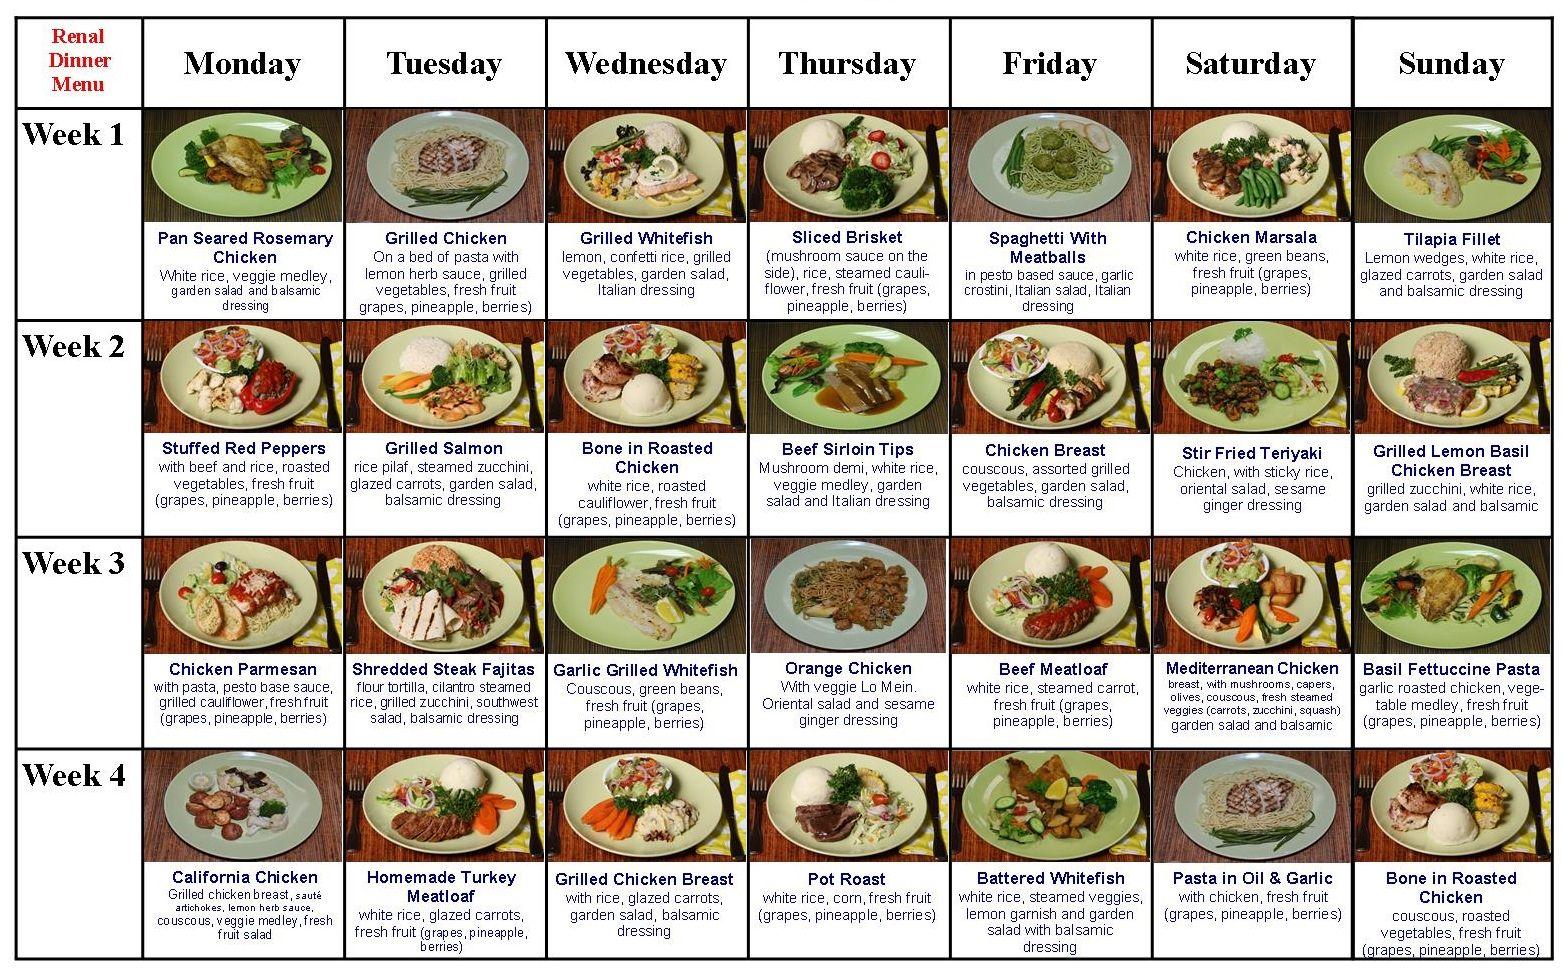 The Renal Diet Menu Restricted Diet Never Tasted So Good Renal Diet Foods Renal Diet Low Potassium Diet Renal Diet Recipes Low Potassium Diet Renal Diet